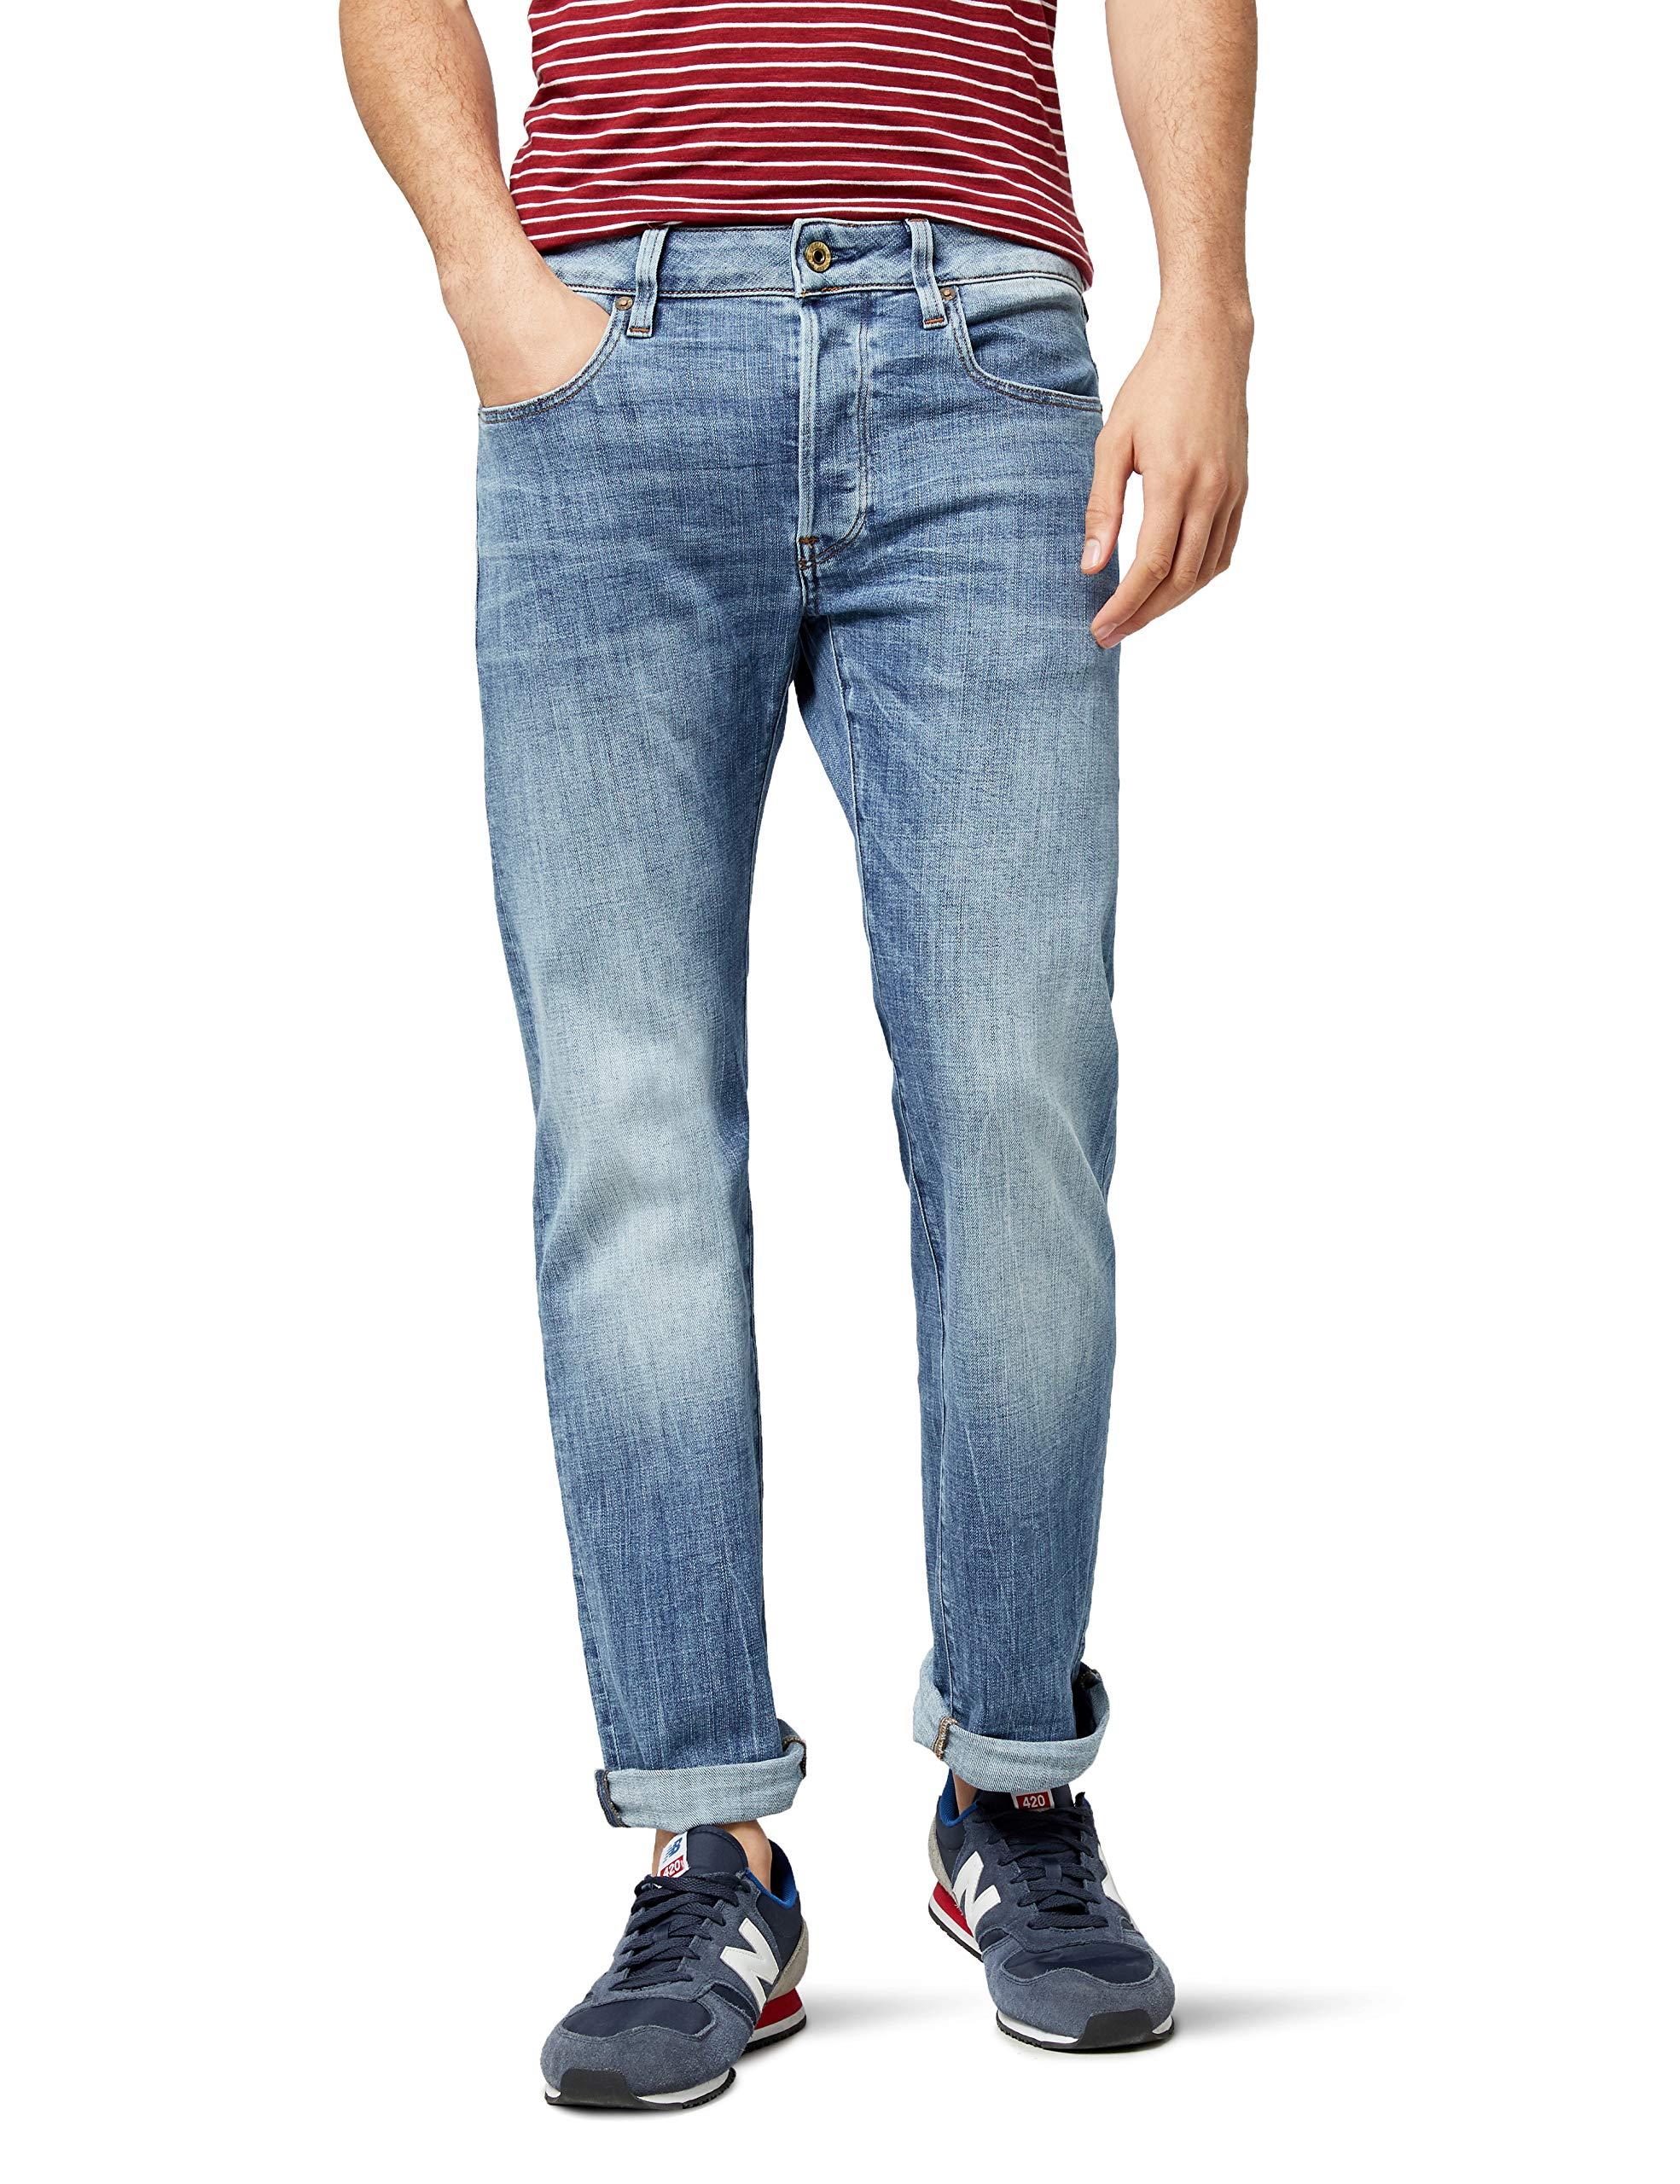 HommeBleulight l30 G RawJeans AgedW33 star Droit BWCxrdoe